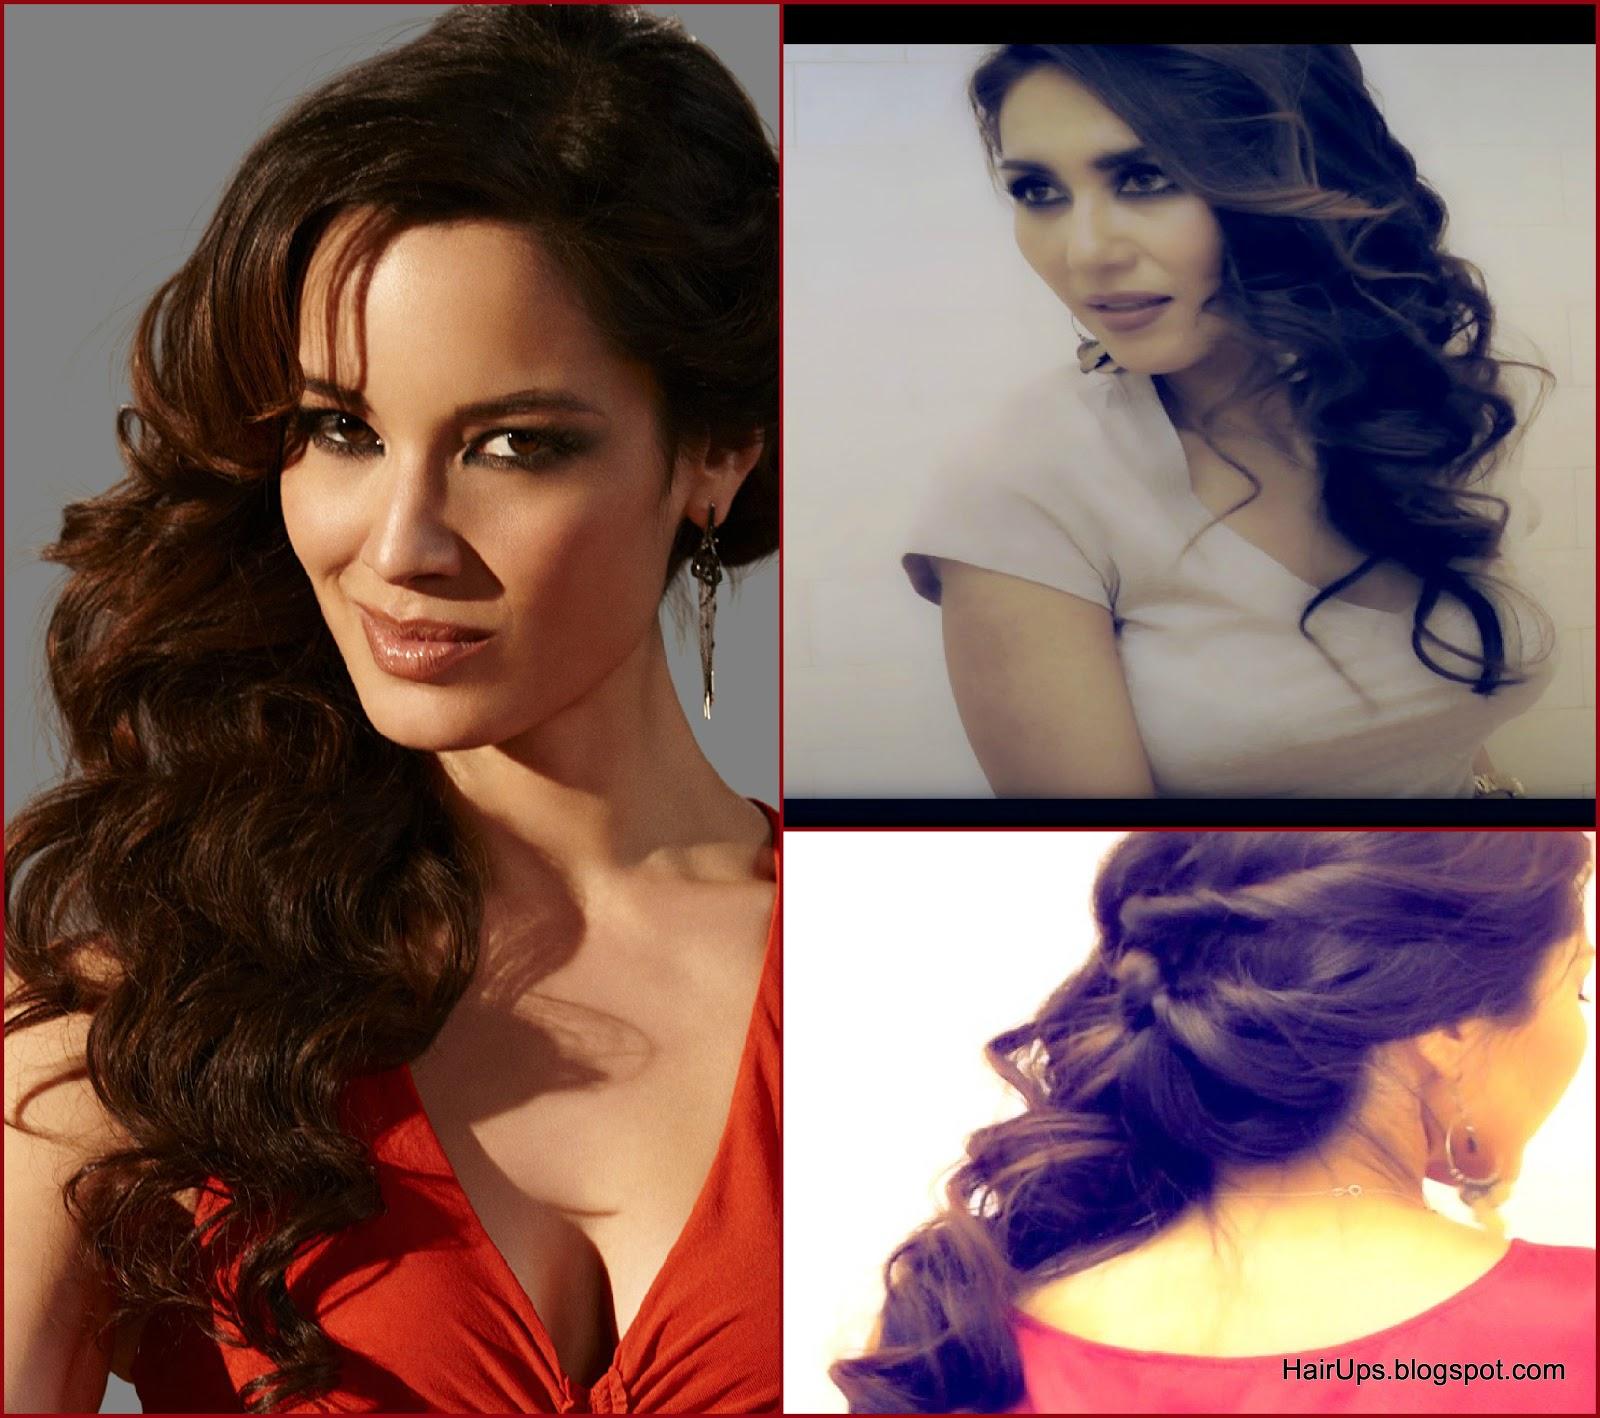 007 bond girl, side curly half-up hairstyles |cute hair tutorial video